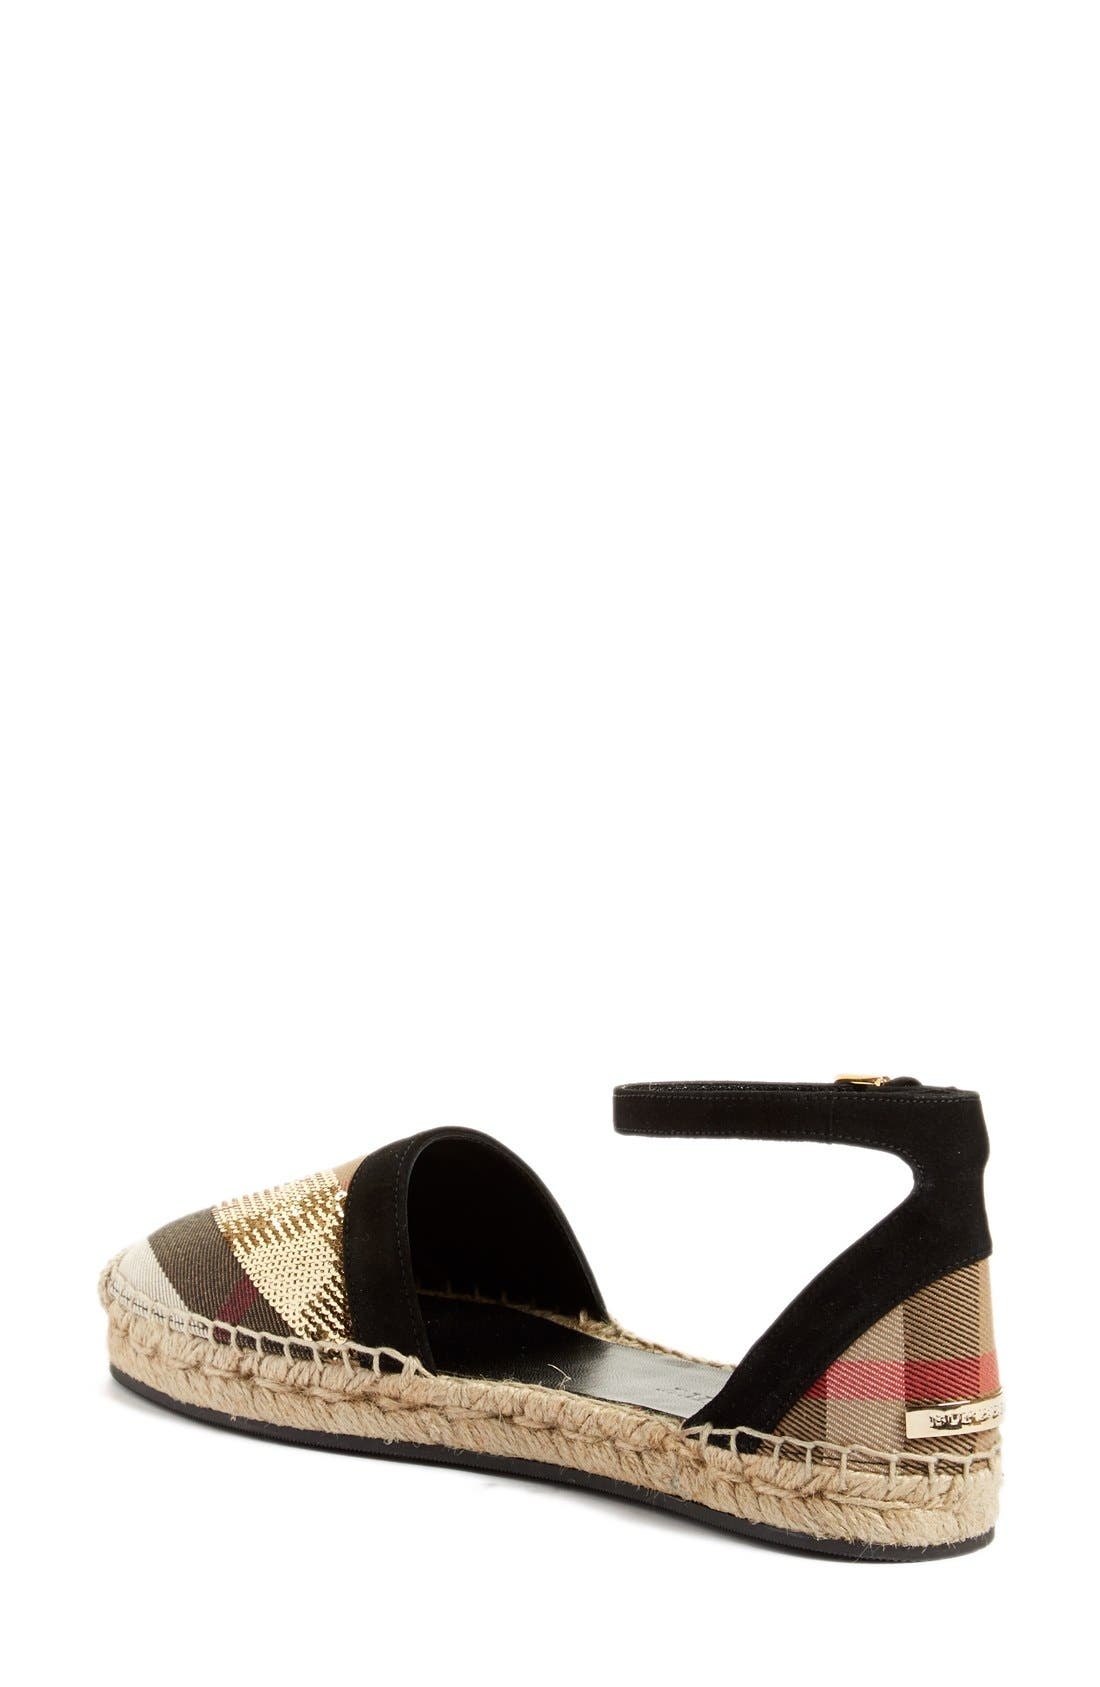 Alternate Image 2  - Burberry 'Abbingdon' Ankle Strap Espadrille Sandal (Women)